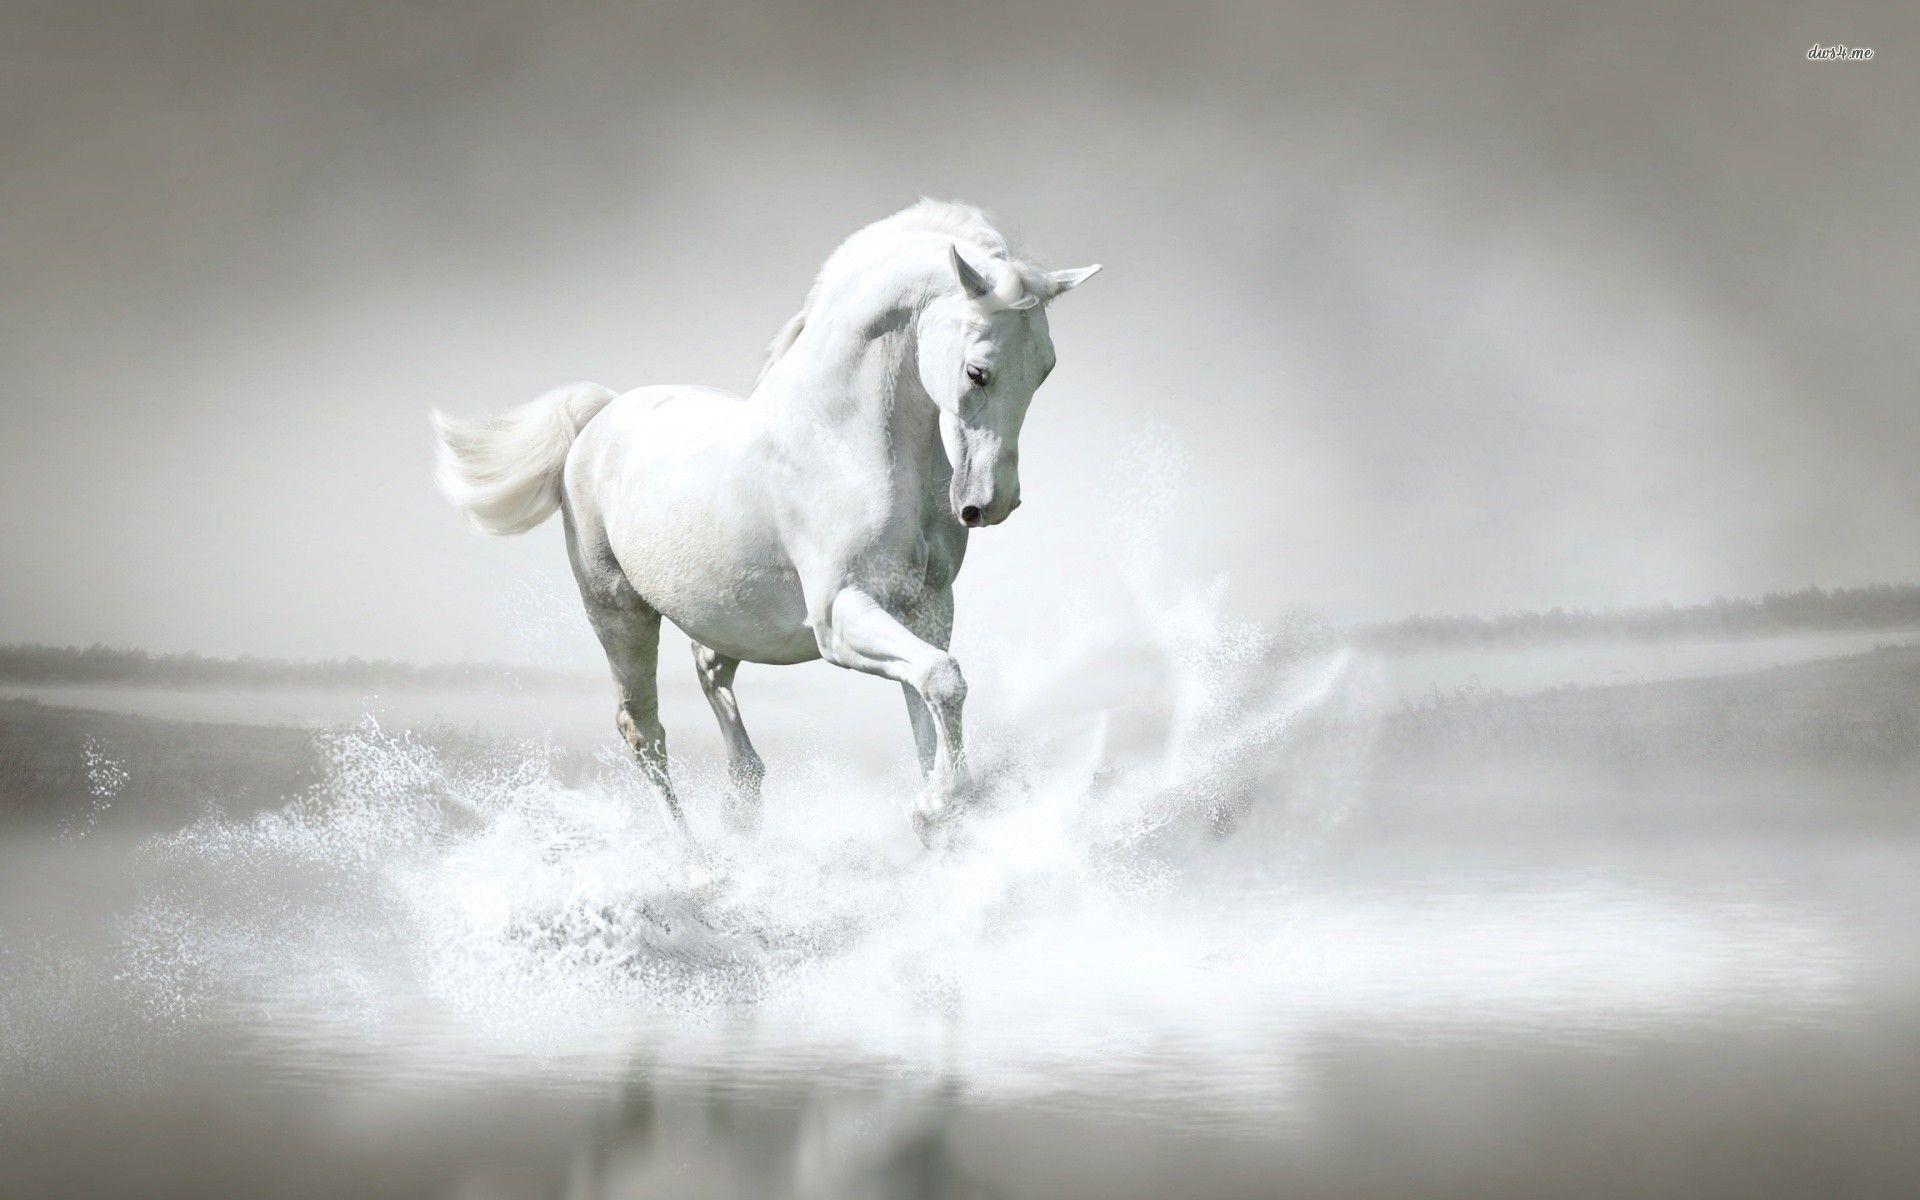 Computer Horse Wallpapers, Desktop Backgrounds px